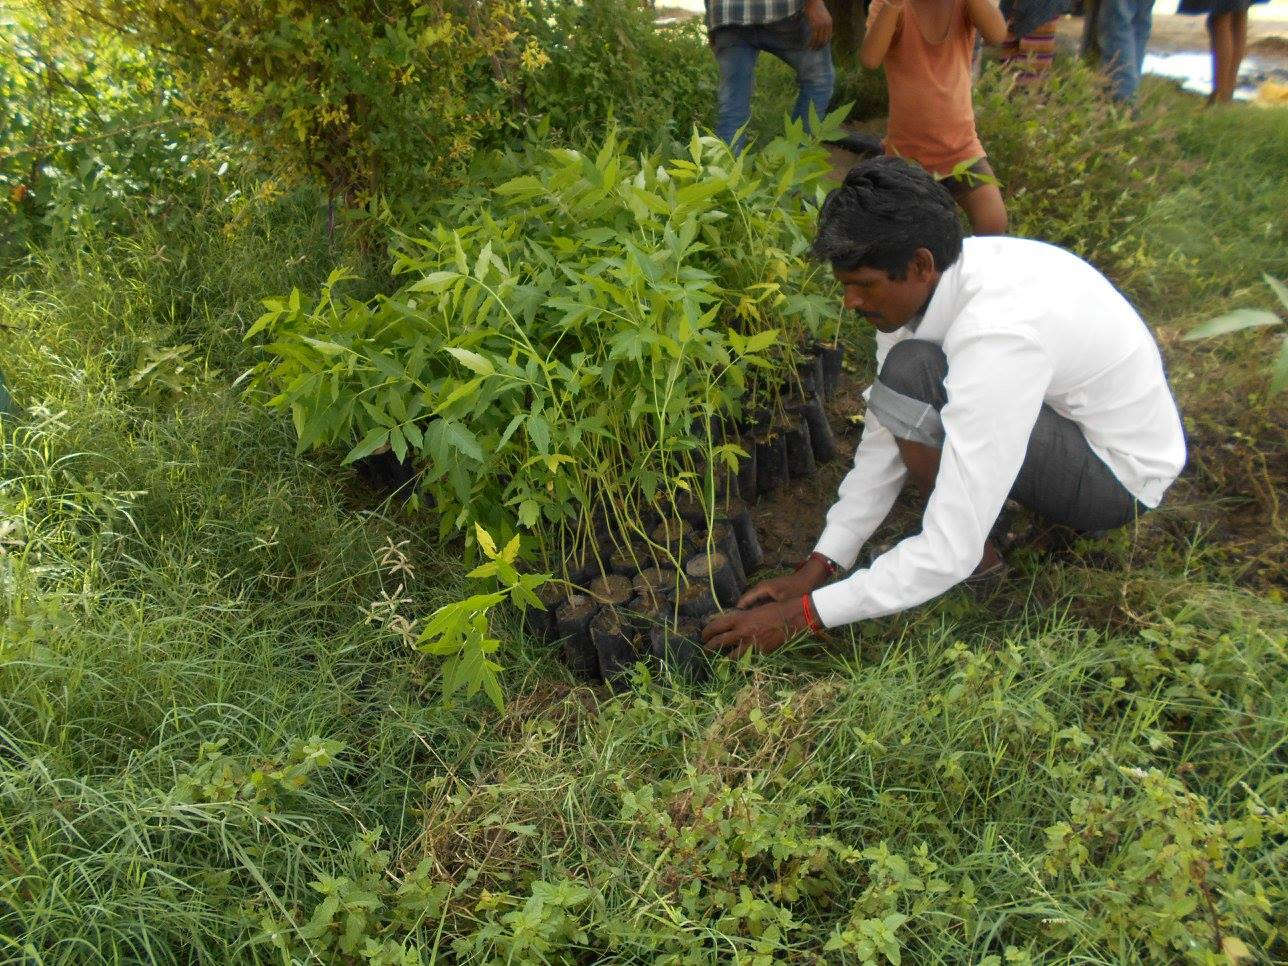 Planting efforts begin